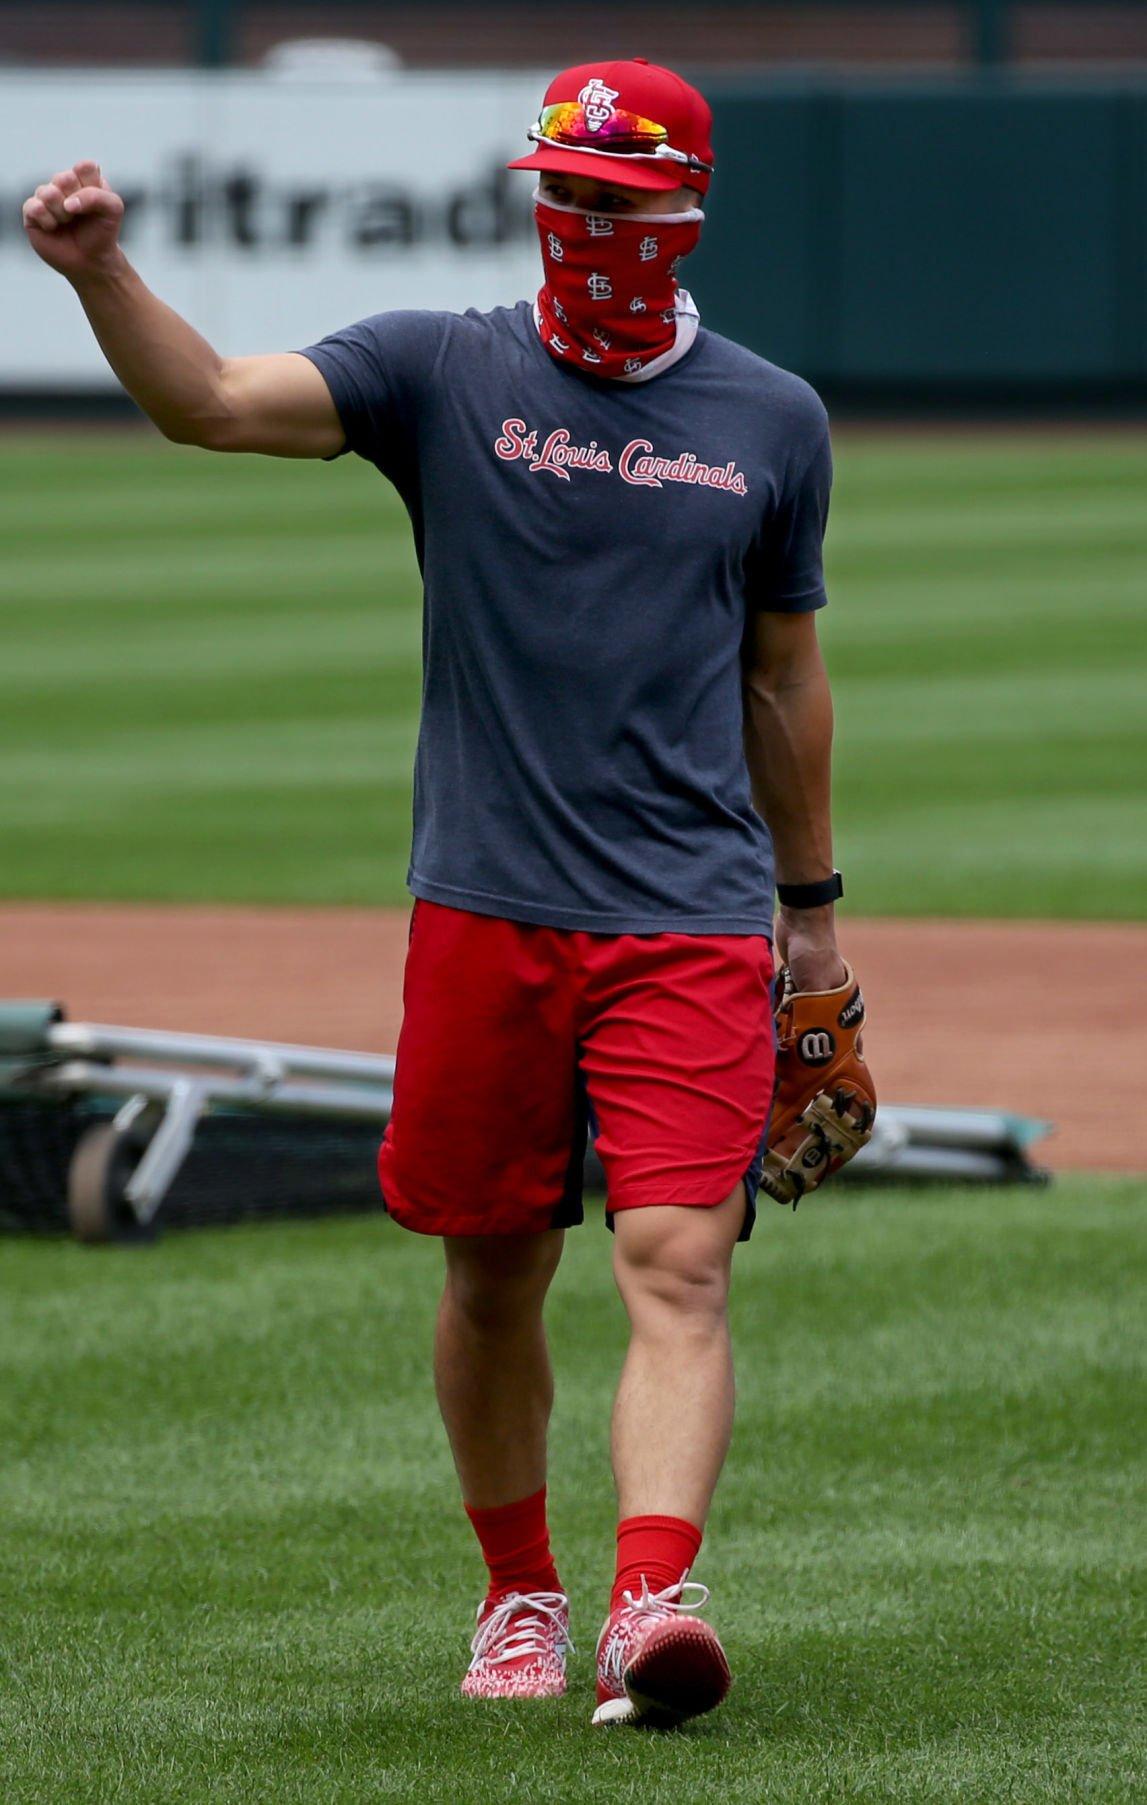 Cardinals resume practice at Busch